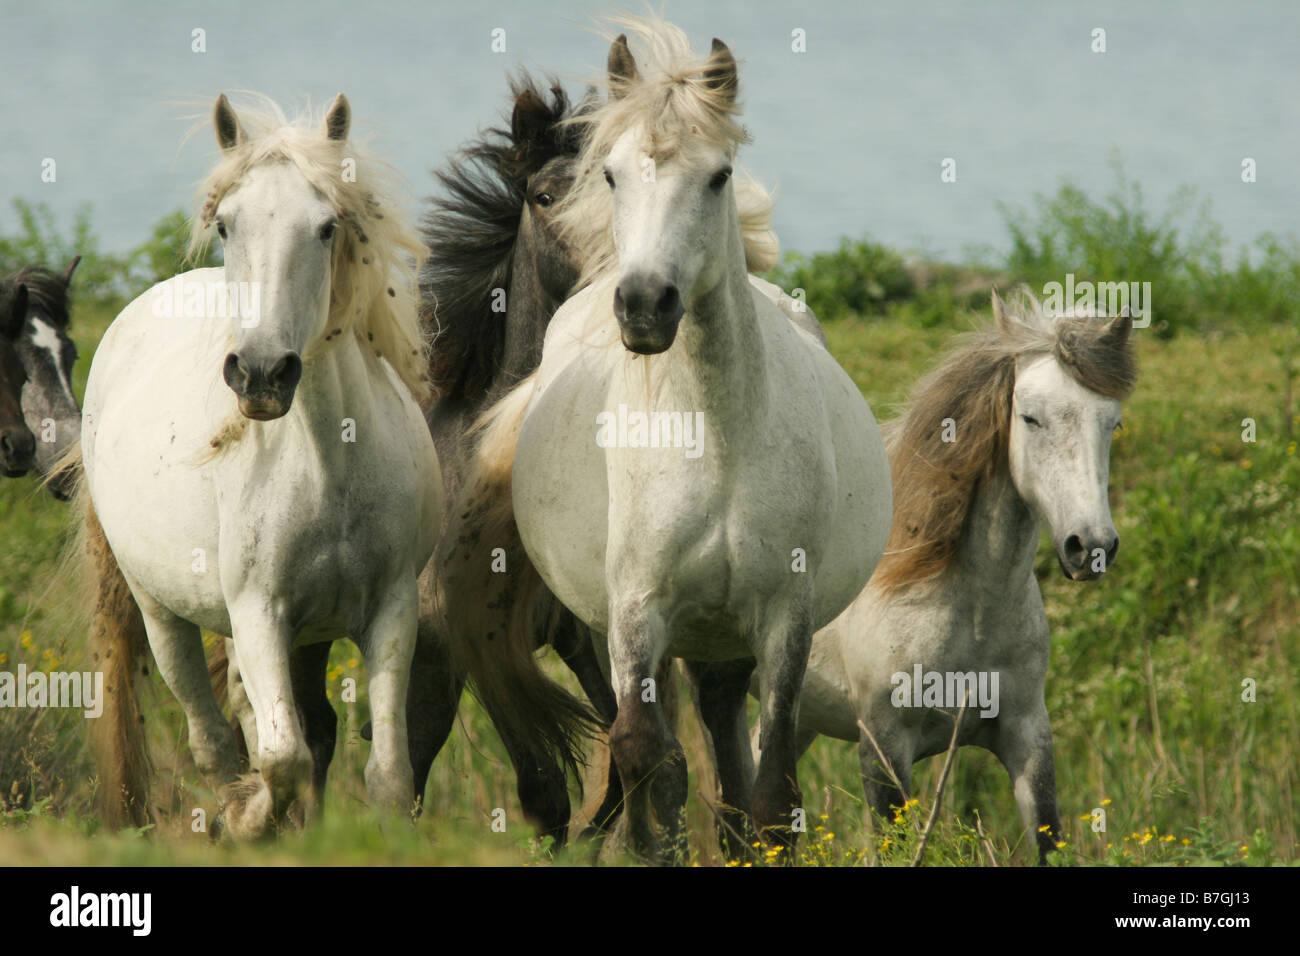 Horses, Mammals, Movement, Stallion, Ungulate - Stock Image